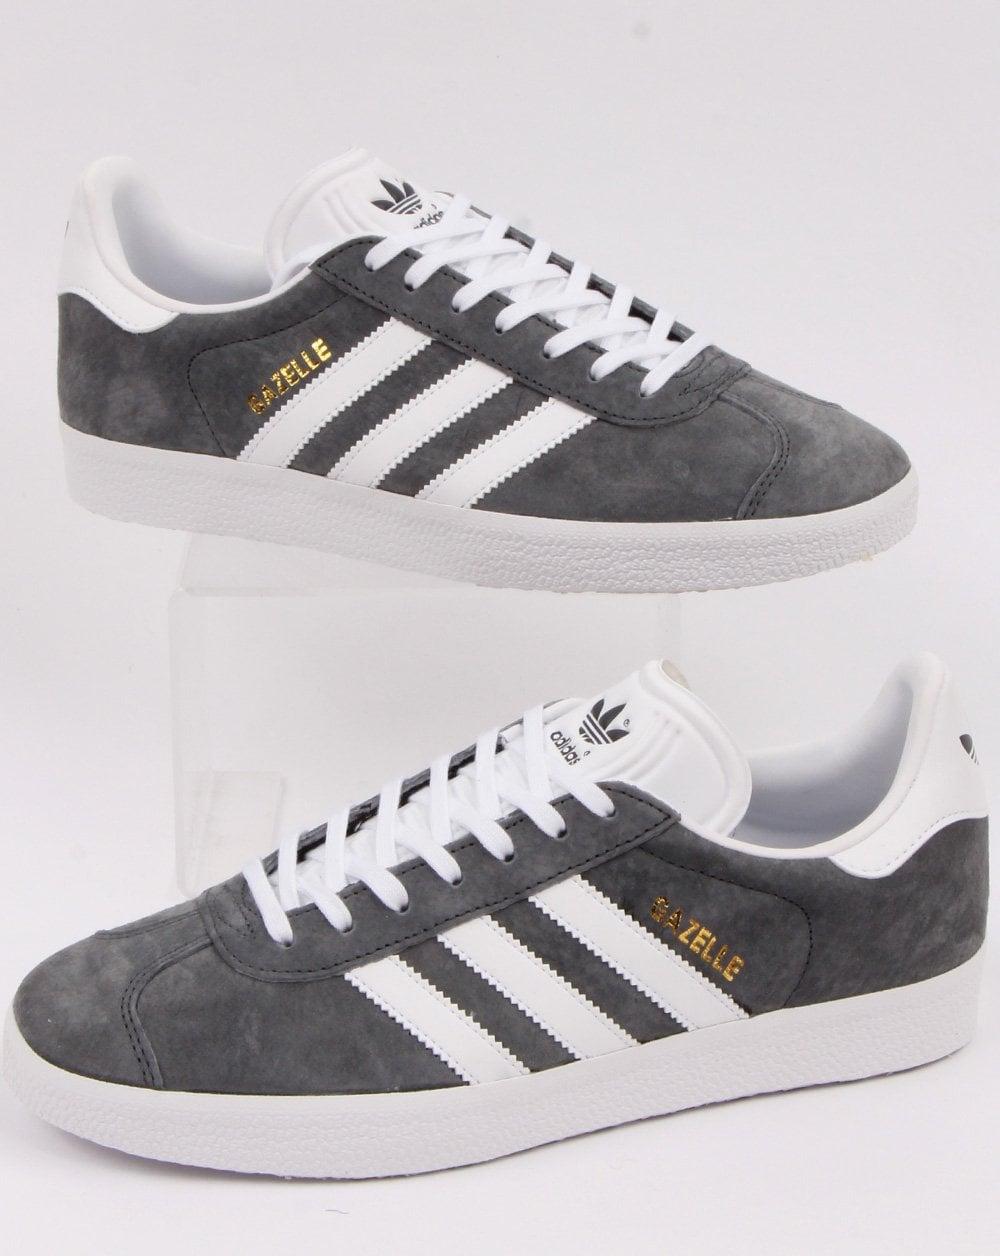 Adidas Gazelle Suede Trainers Dark Grey